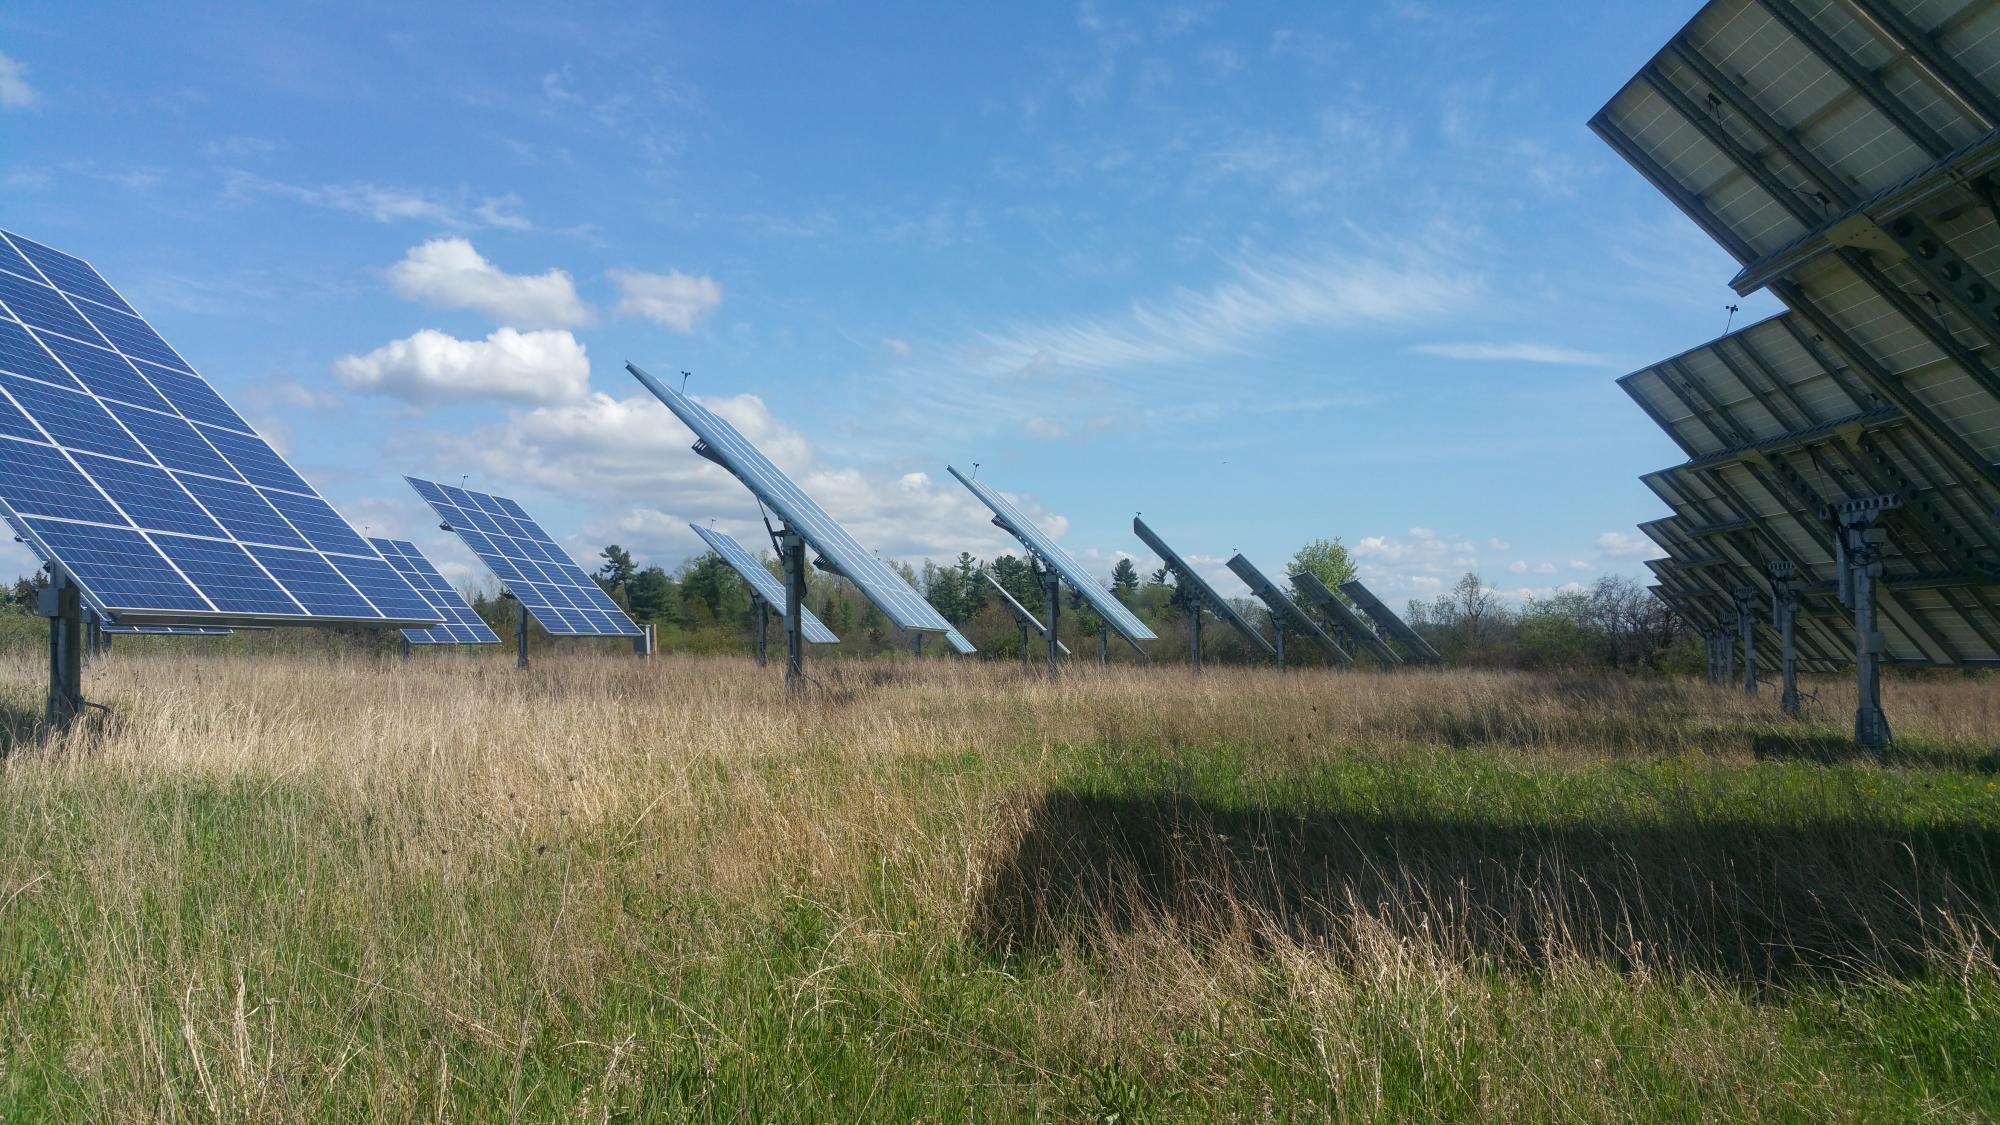 Dual-axis solar tracker